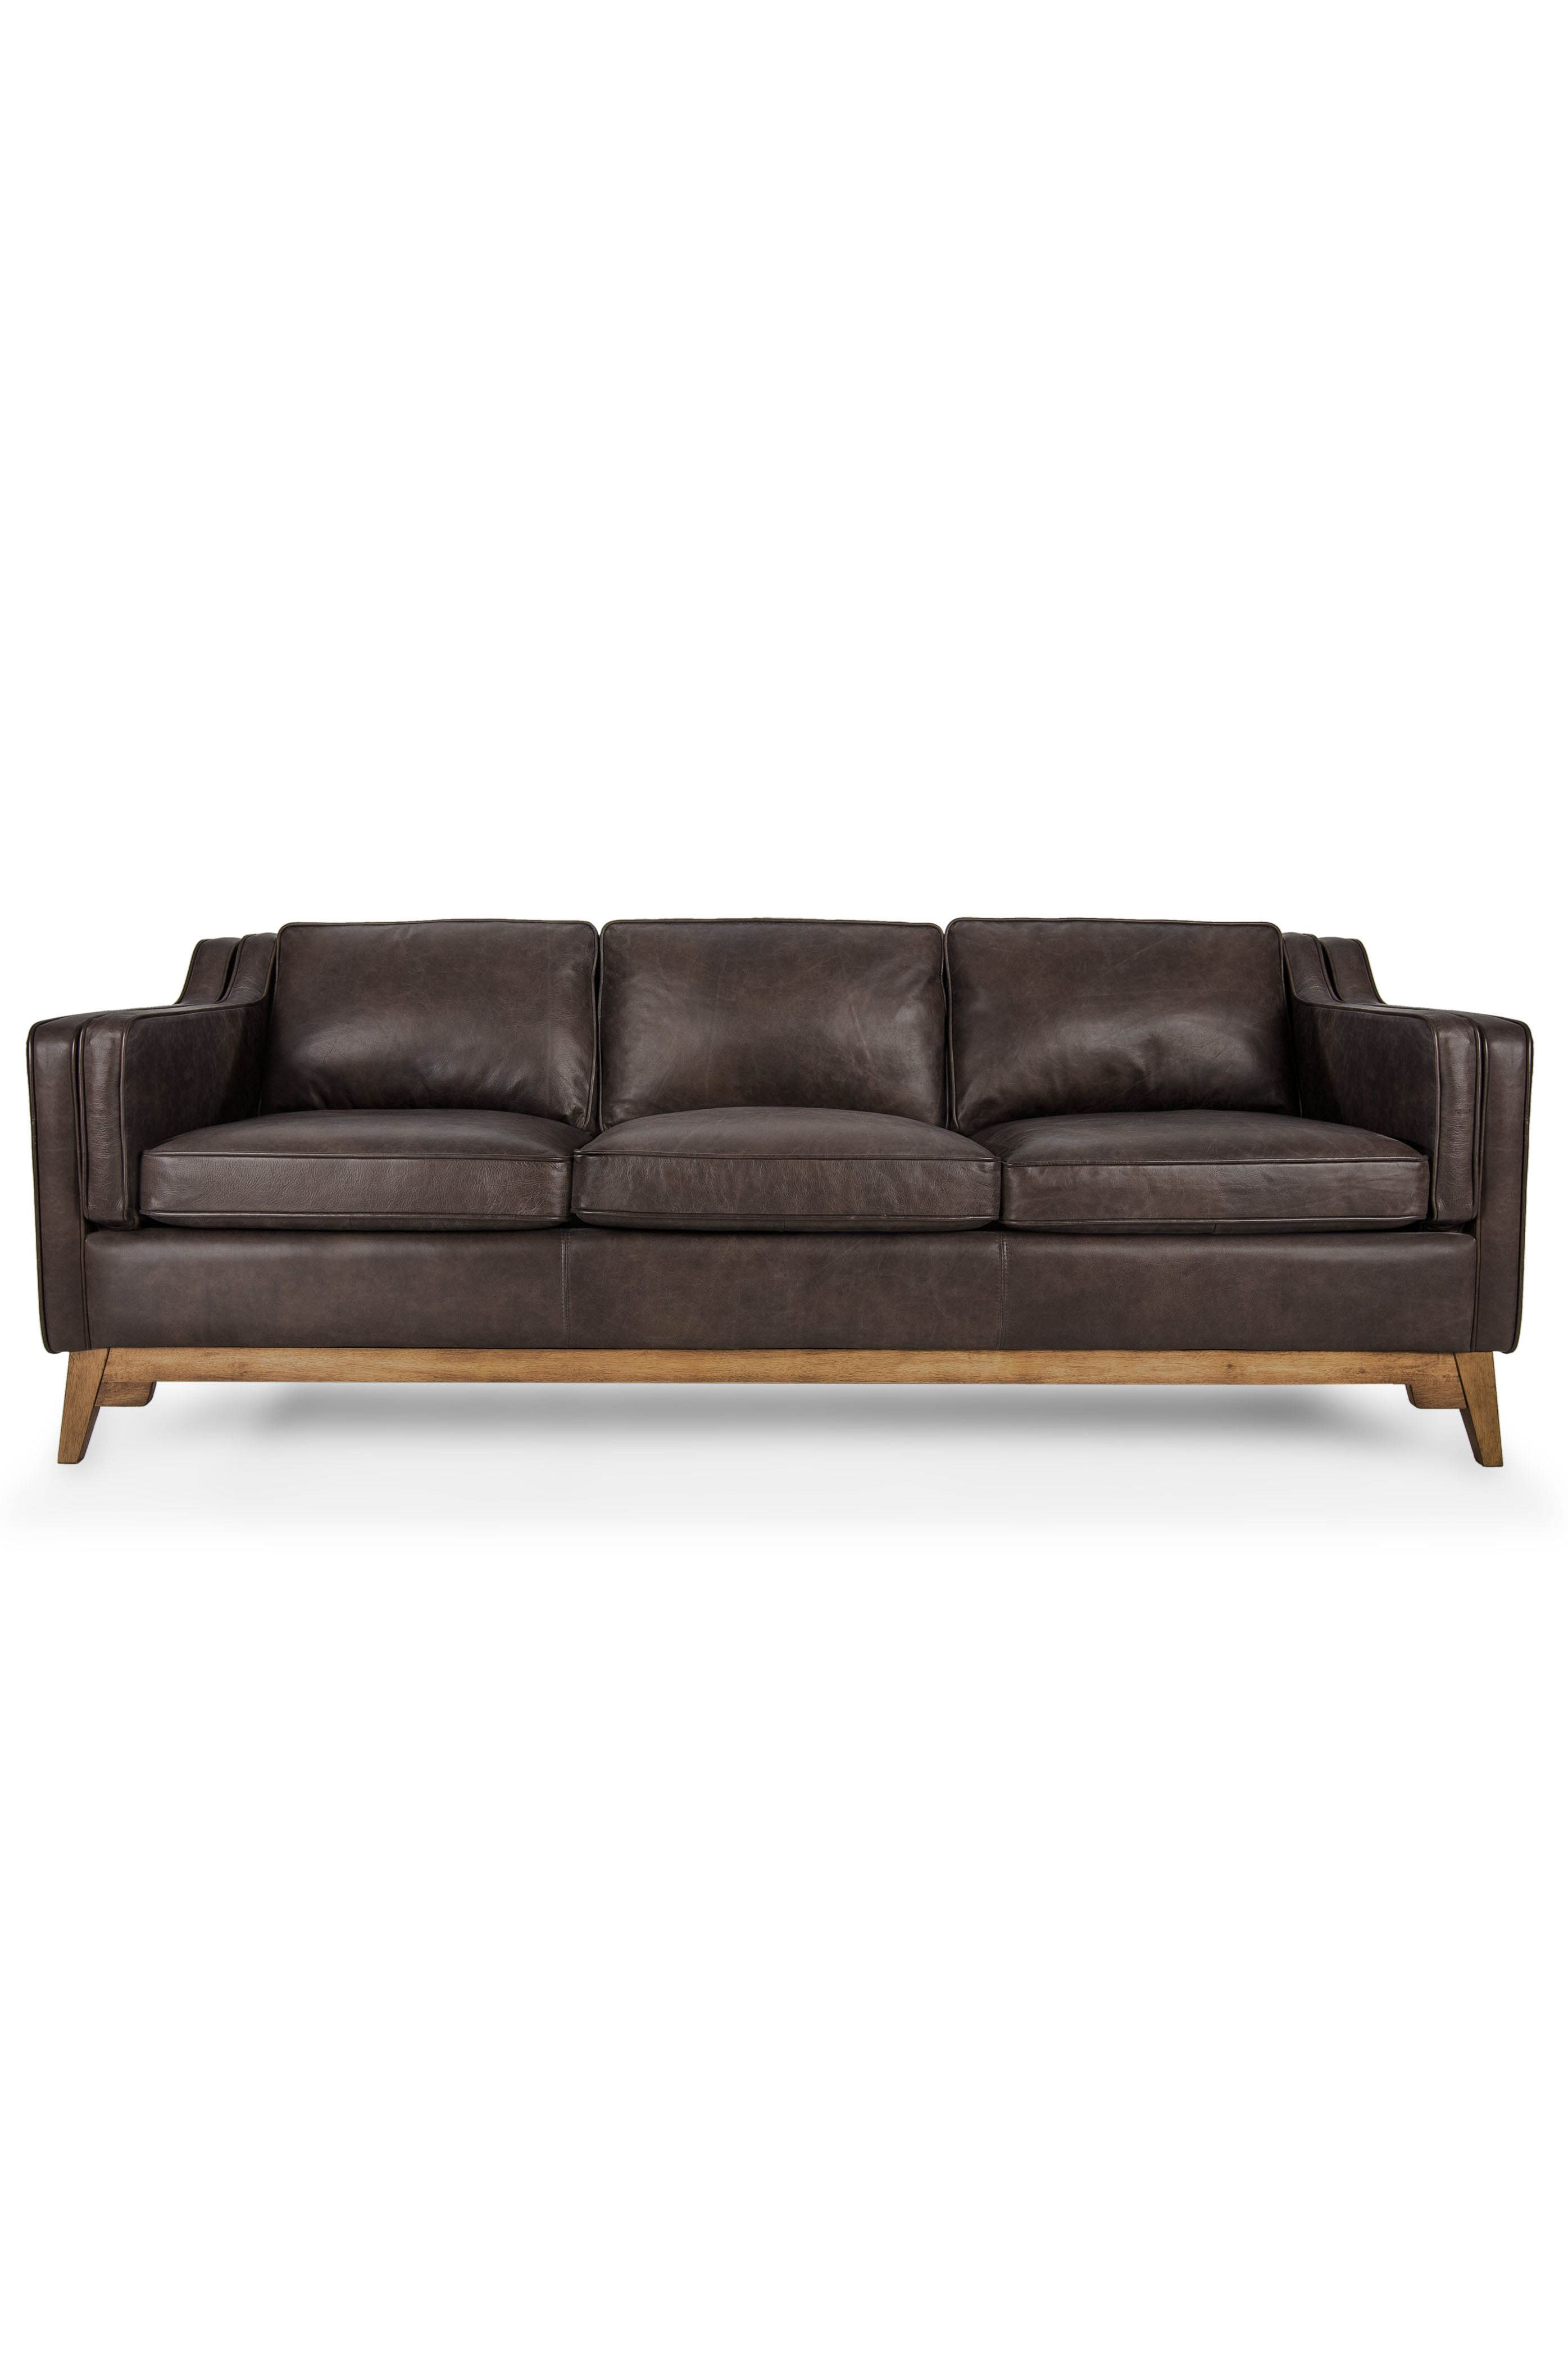 modern brown leather sofa corner uk next upholstered article worthington